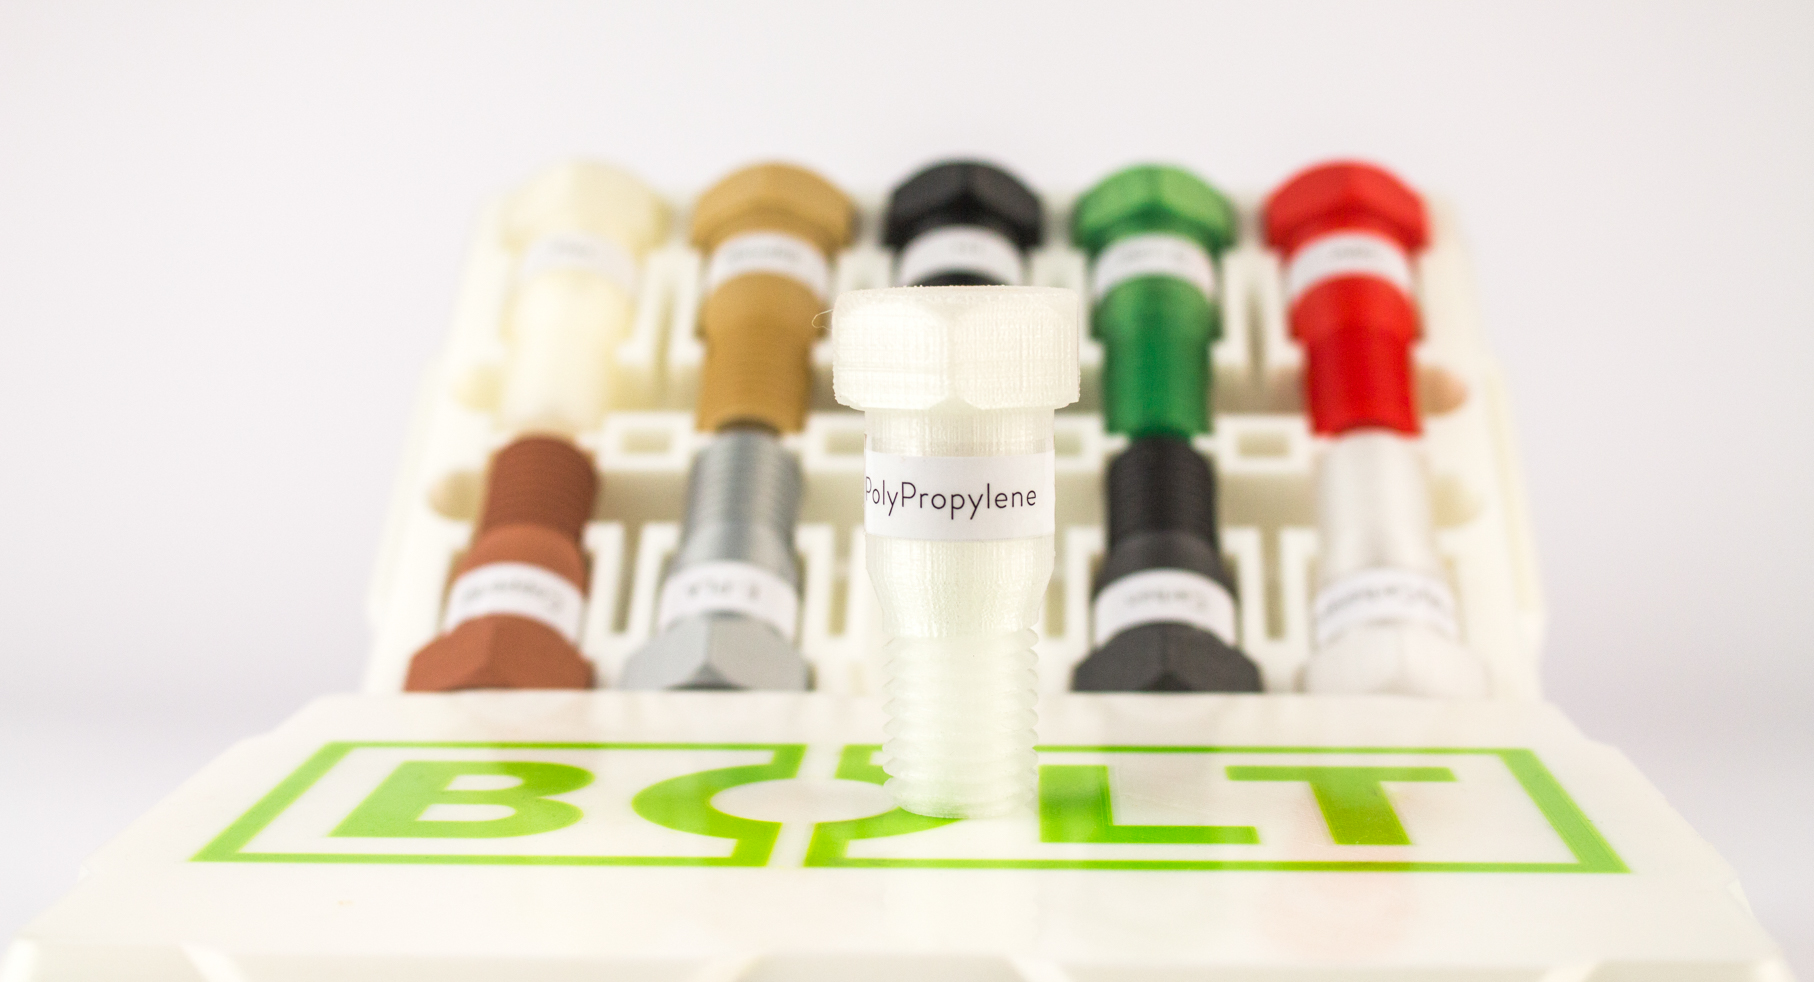 Leapfrog, Polypropylene, PP filament, 3D printing